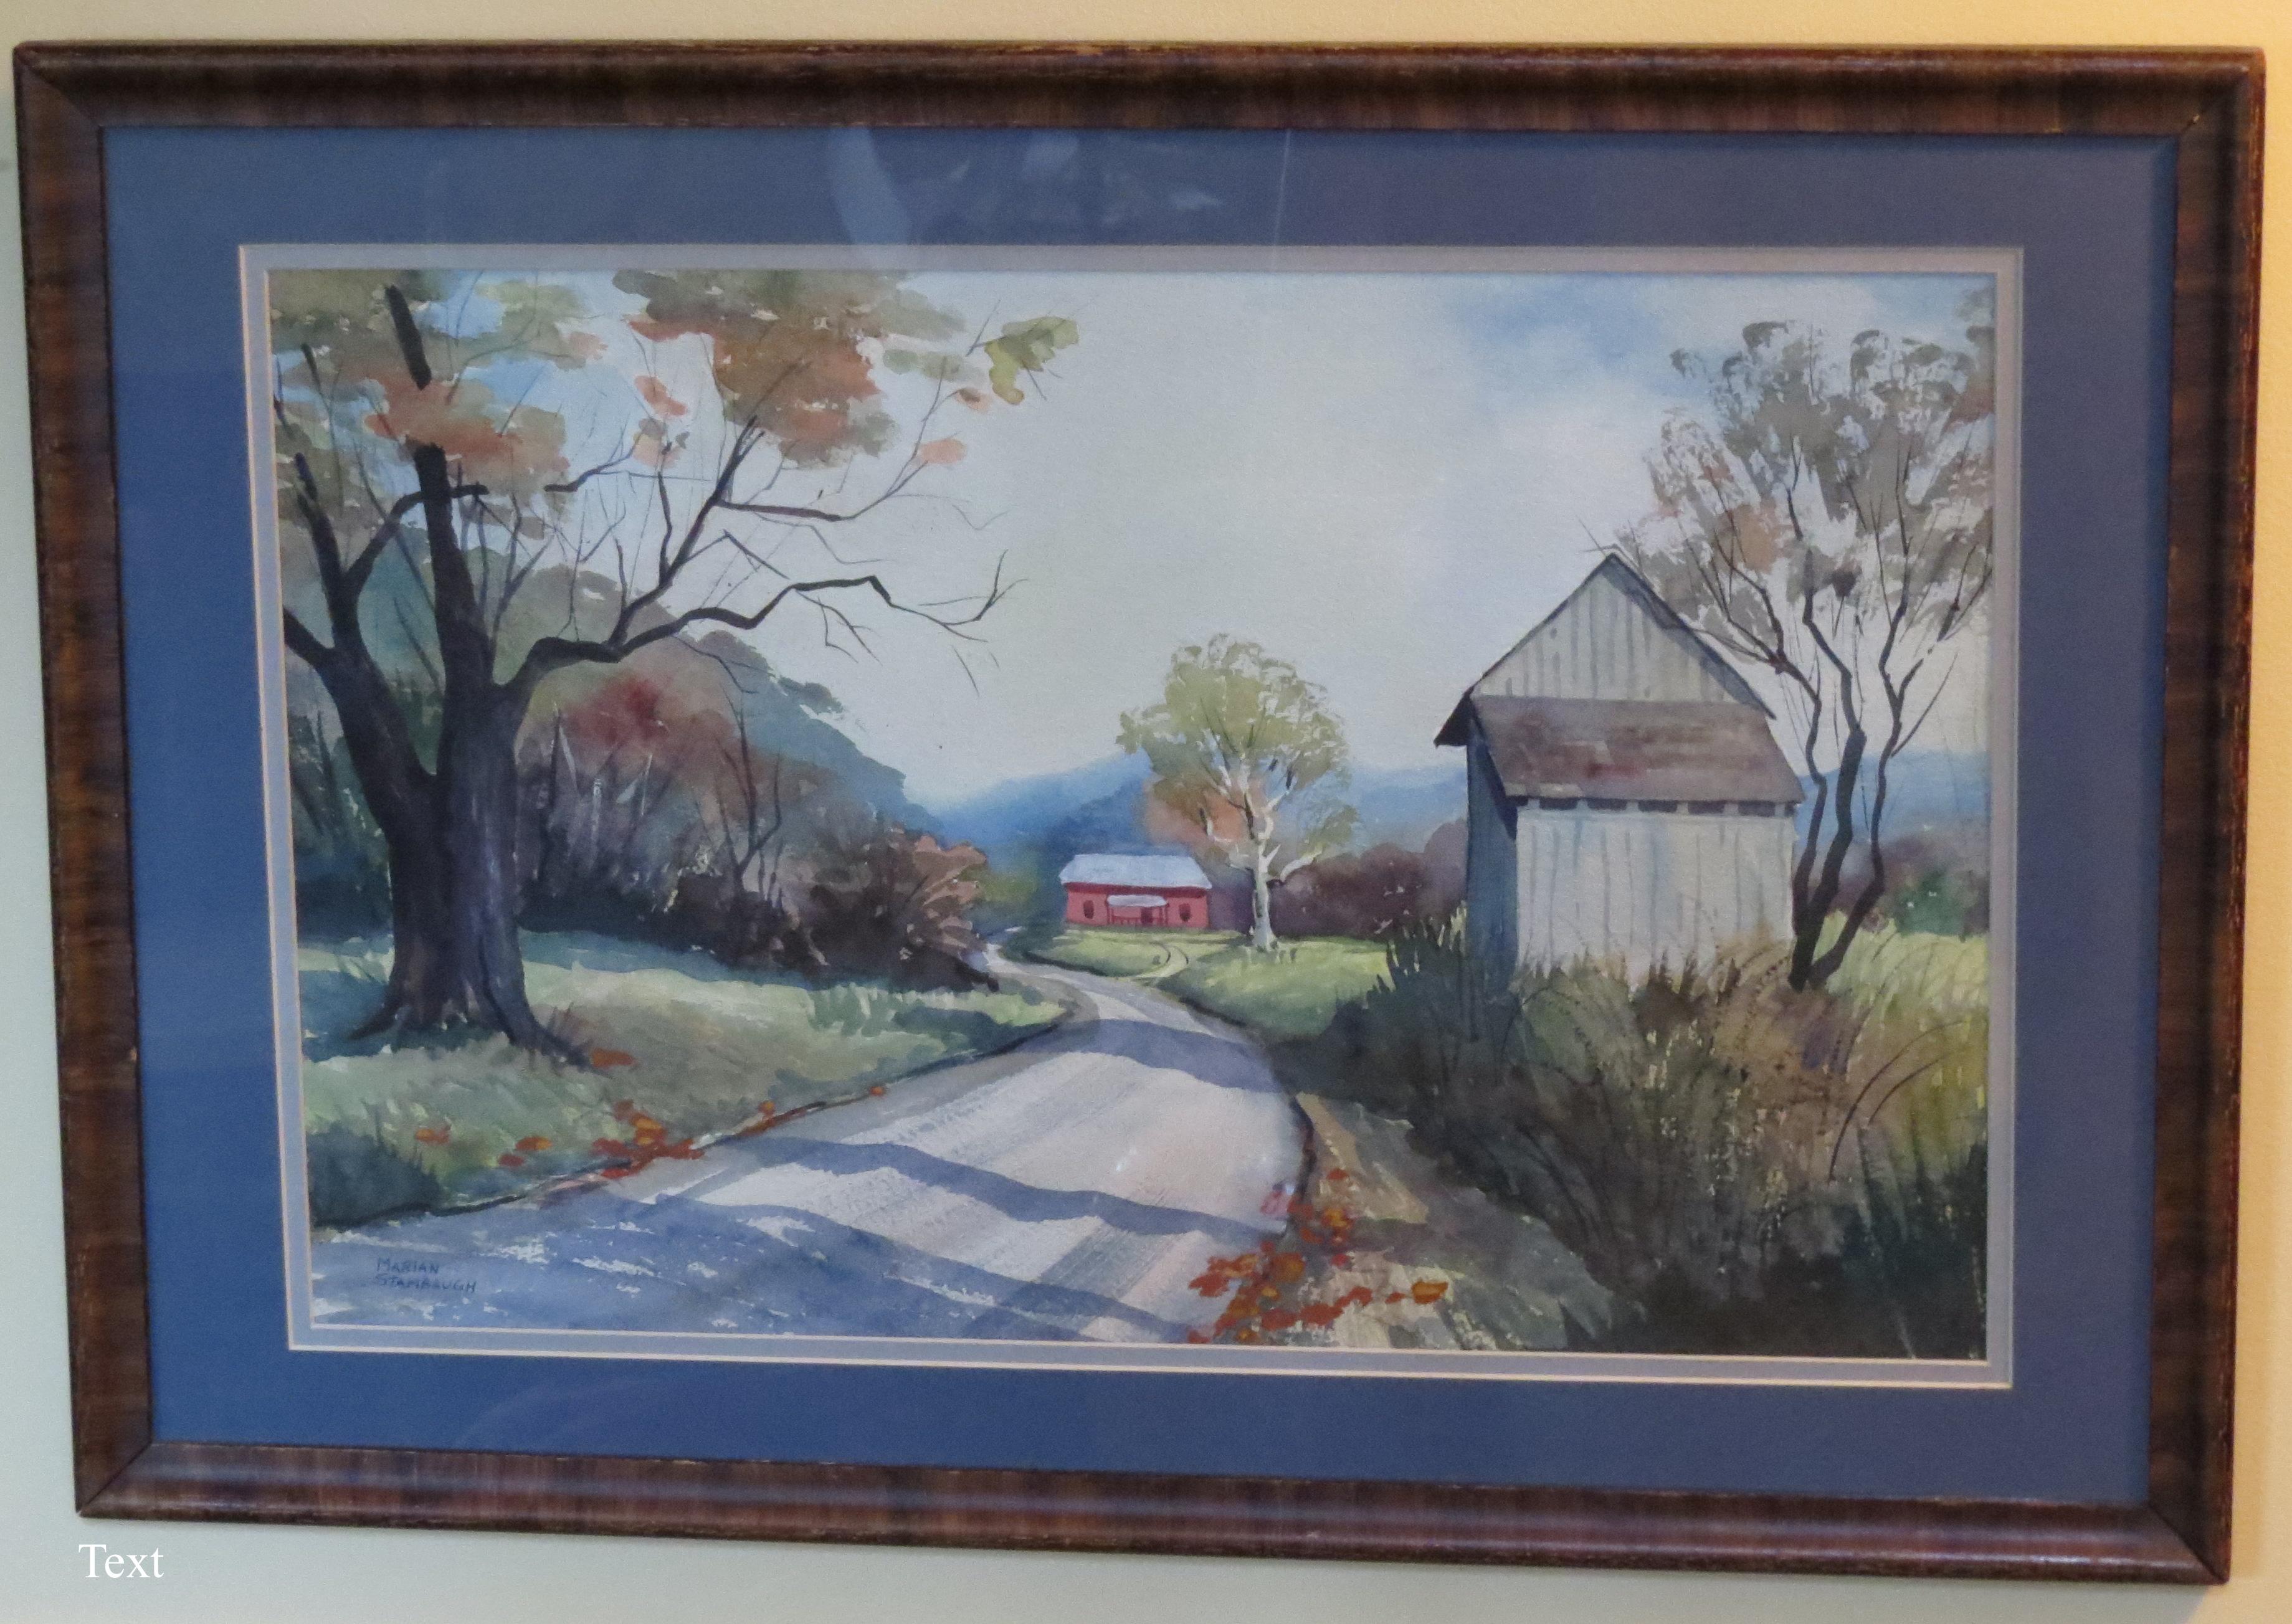 landscape painting, rural road